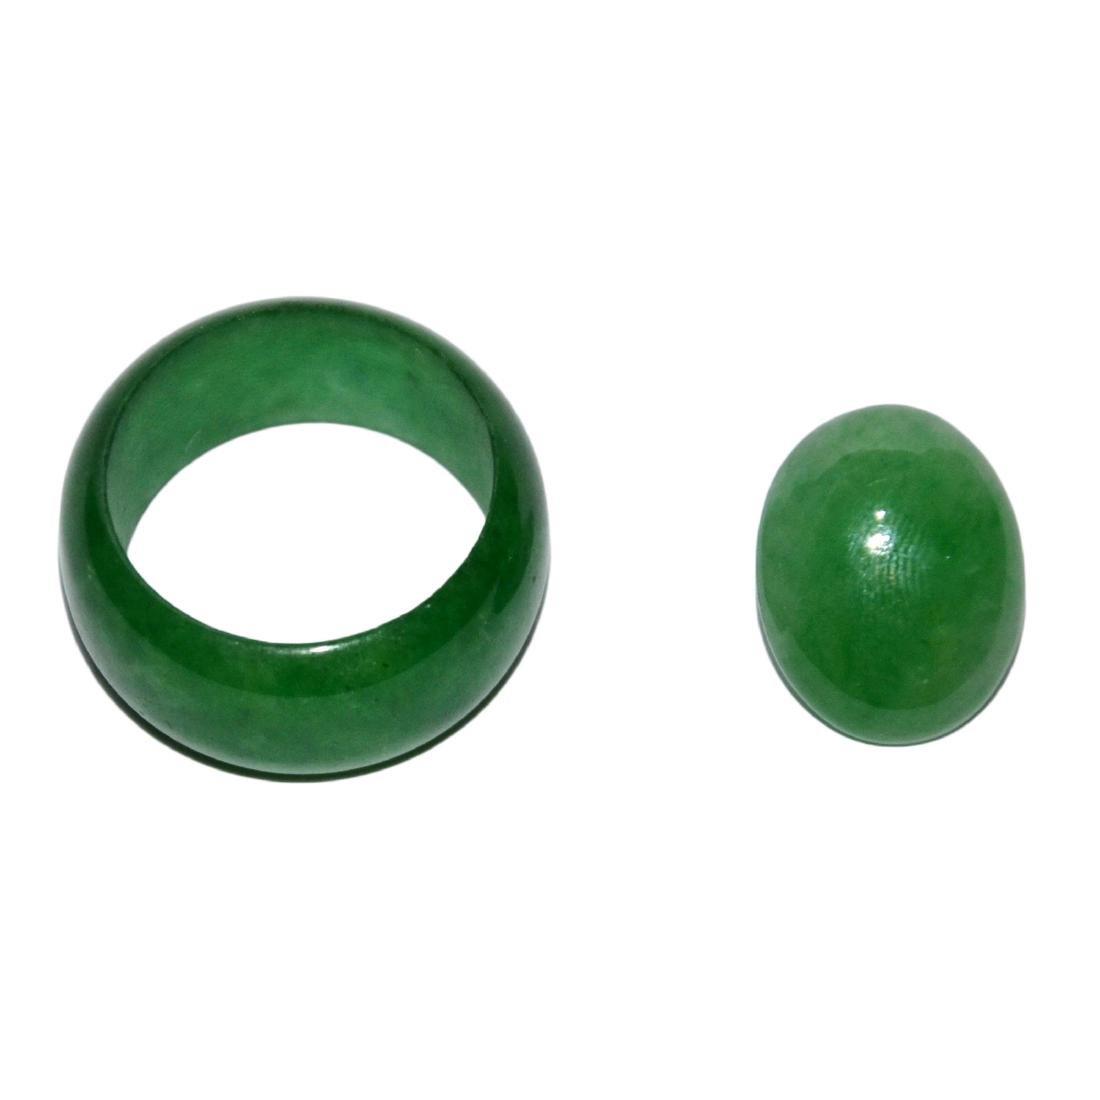 Jadeite Ring, Oval Jadeite Cabochon